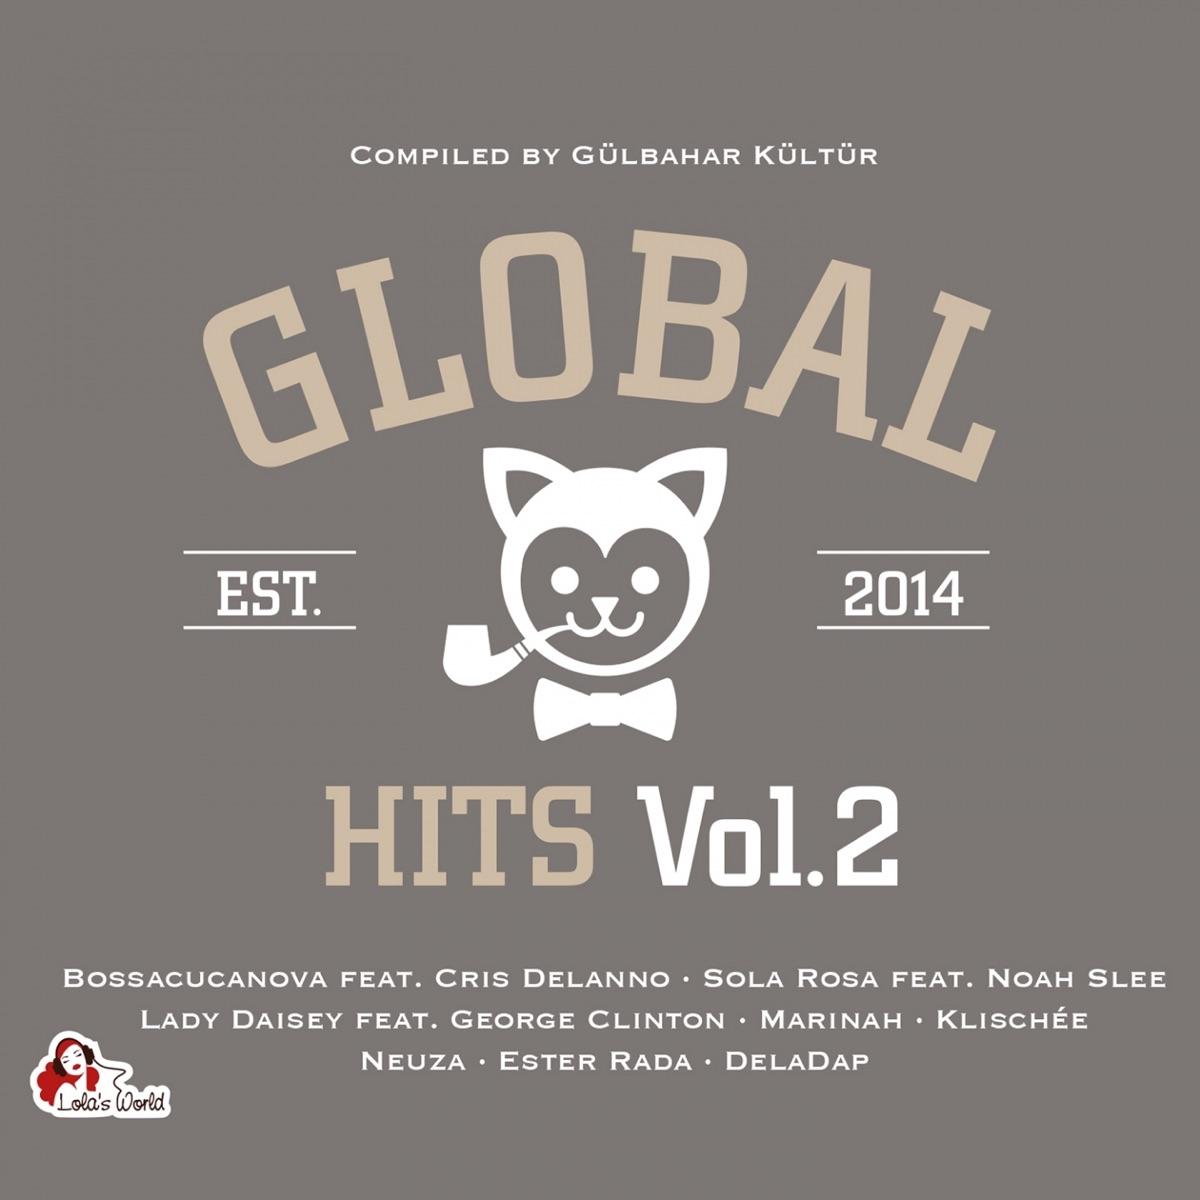 global hits, vol. 2 album cover by gülbahar kültür